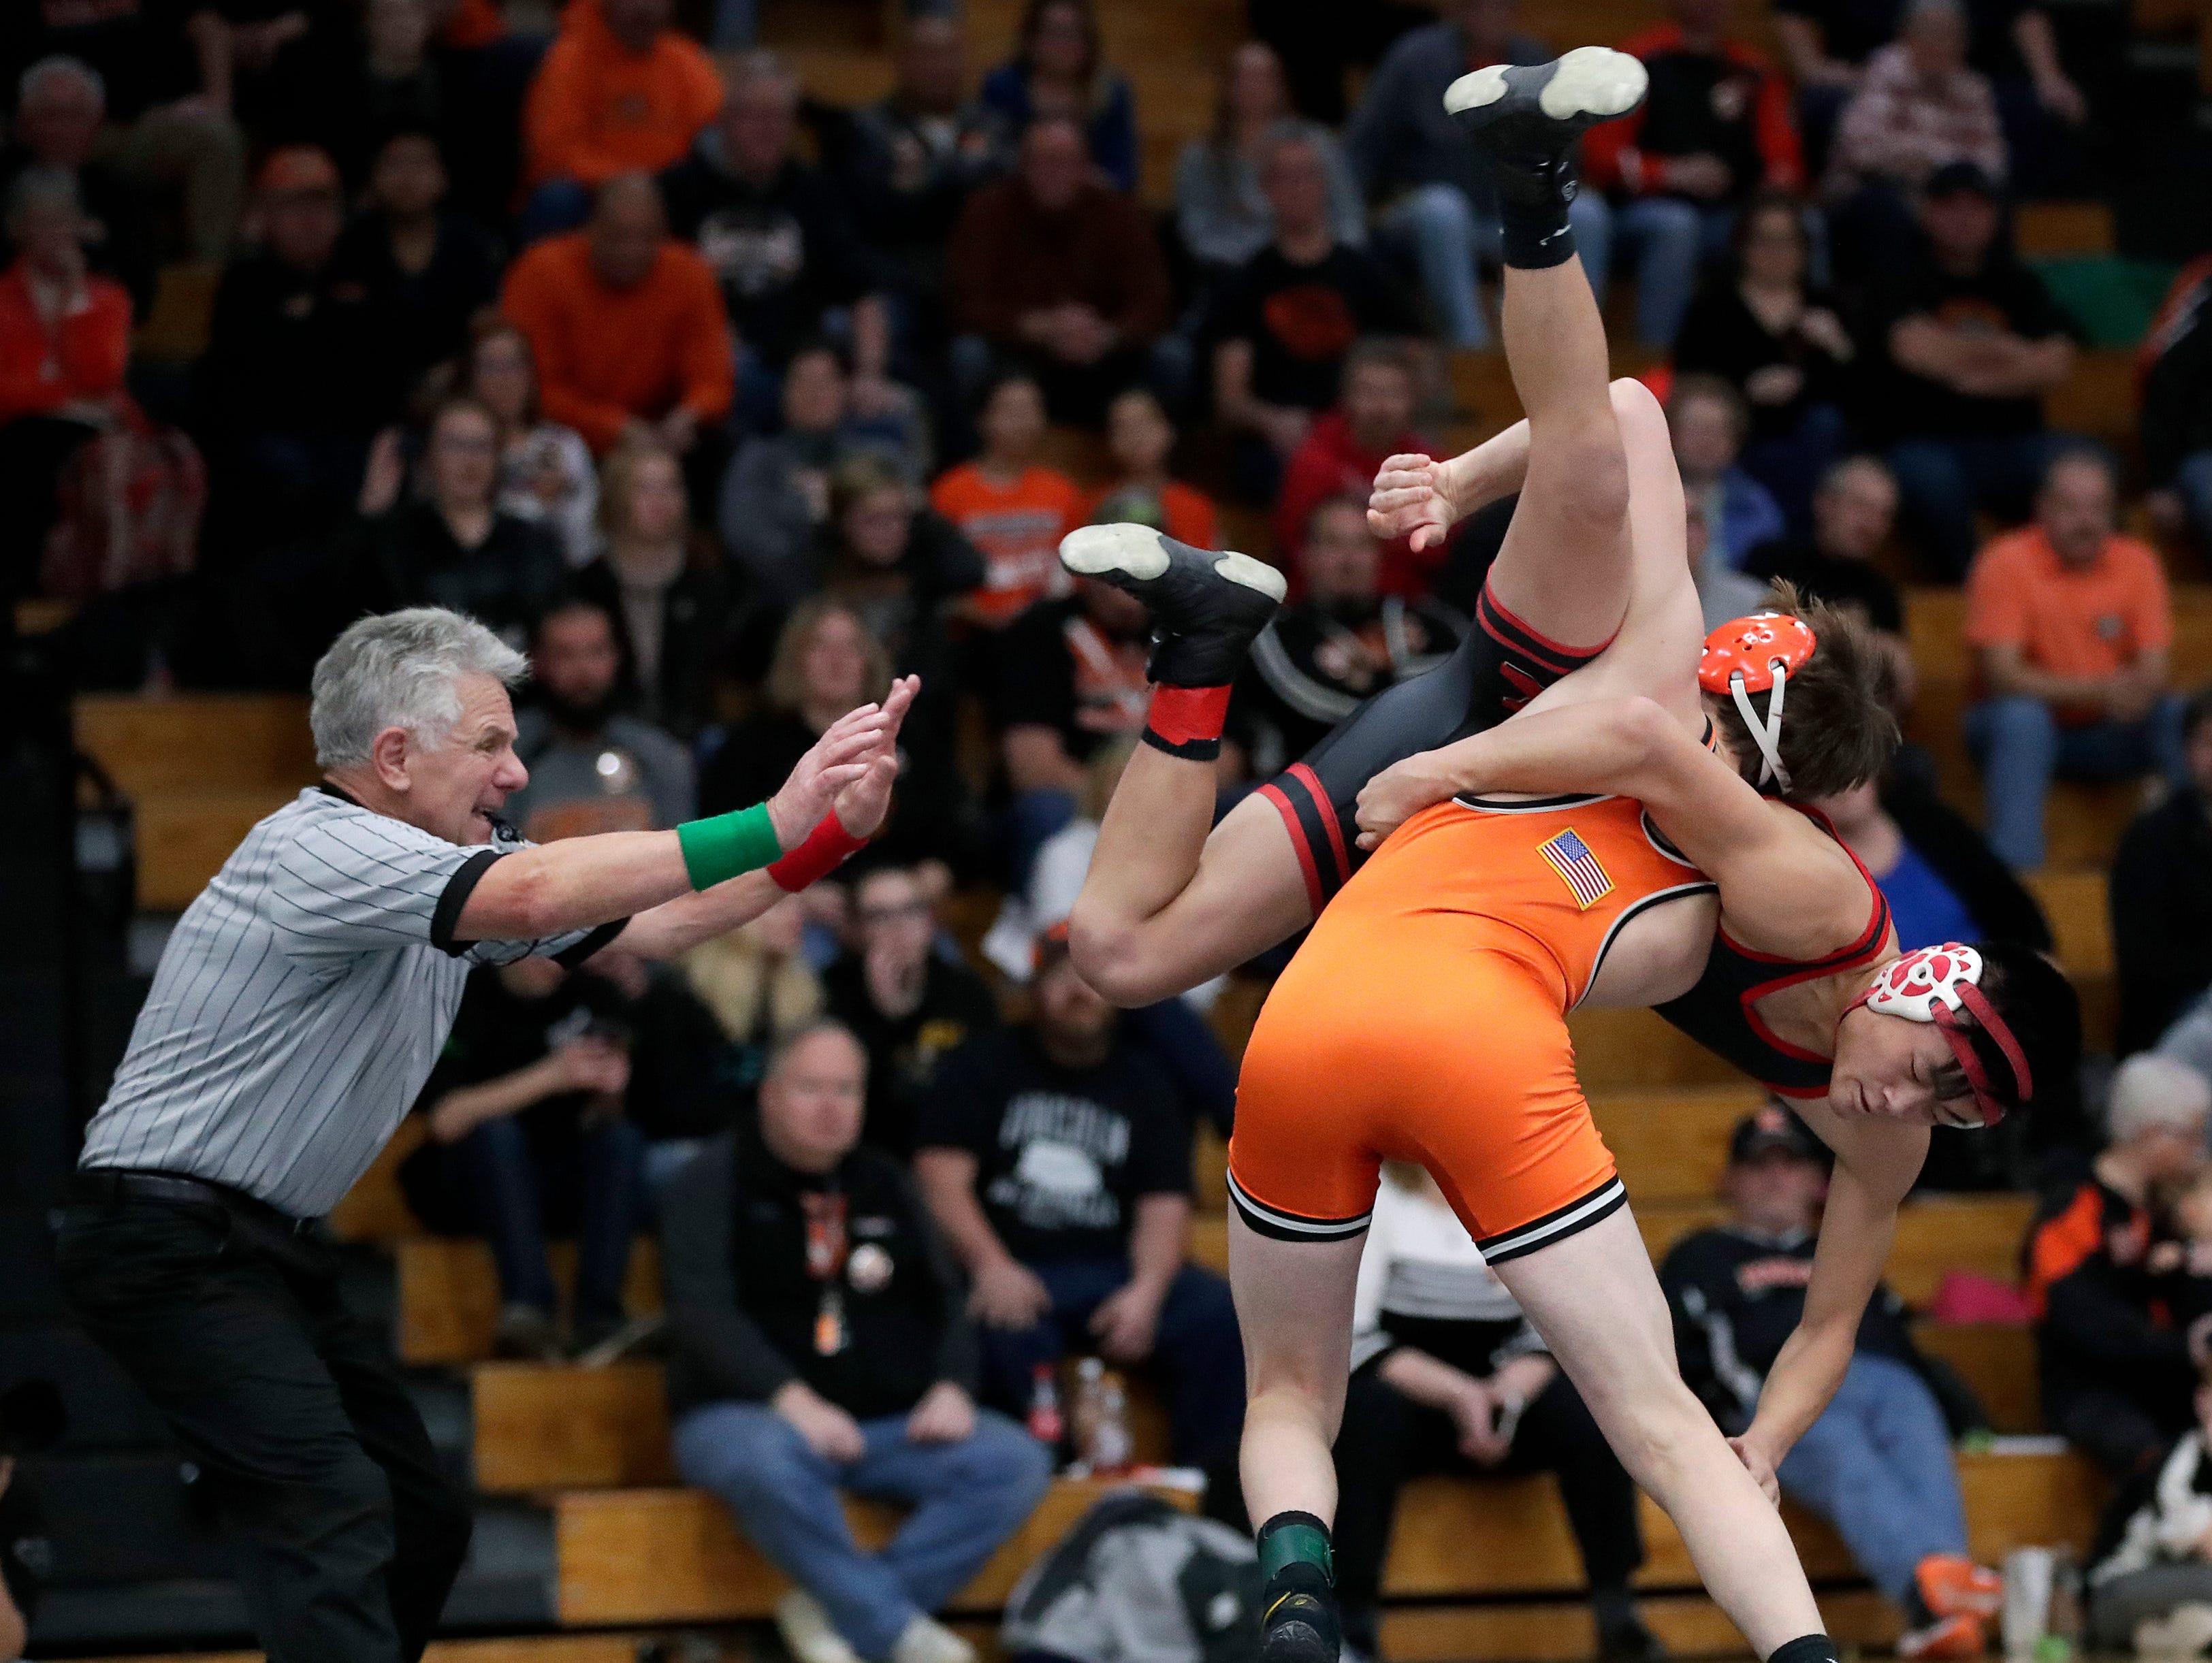 Kaukauna High School's John Diener throws Kimberly High School's Ethan Thao to the mattduring their 138-lb wrestling match Thursday, November 29, 2018, in Kaukauna, Wis. Dan Powers/USA TODAY NETWORK-Wisconsin